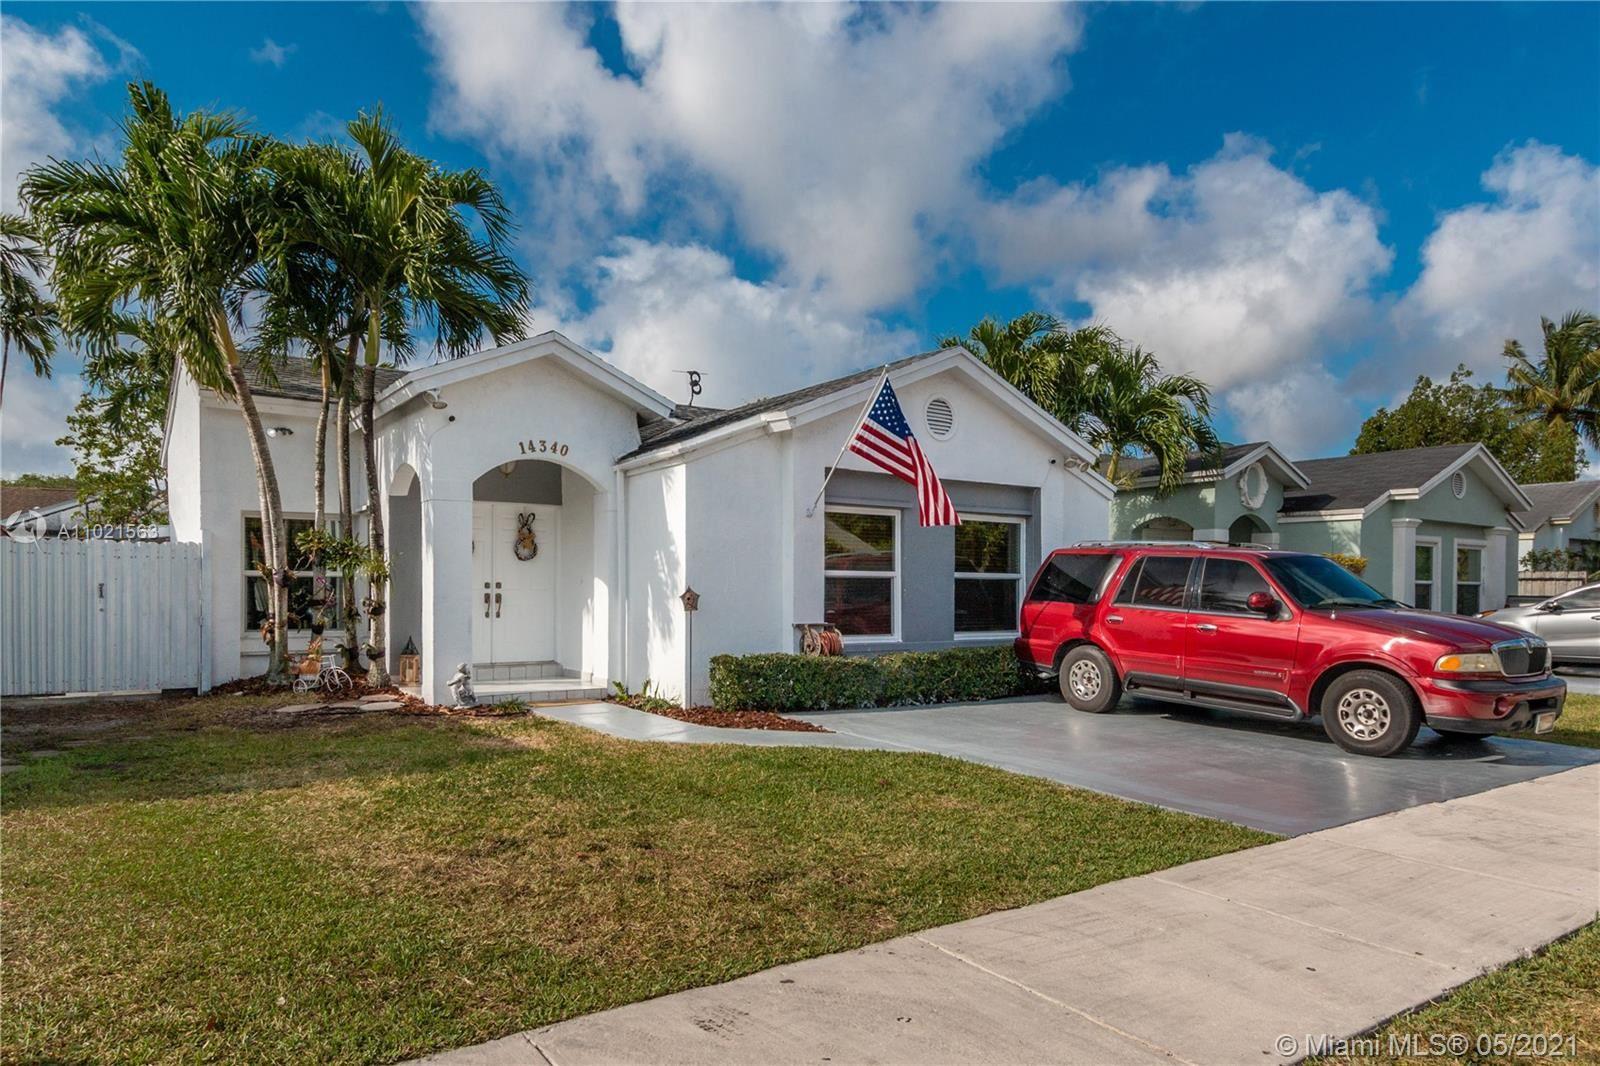 14340 SW 103rd St, Miami, FL 33186 - #: A11021563